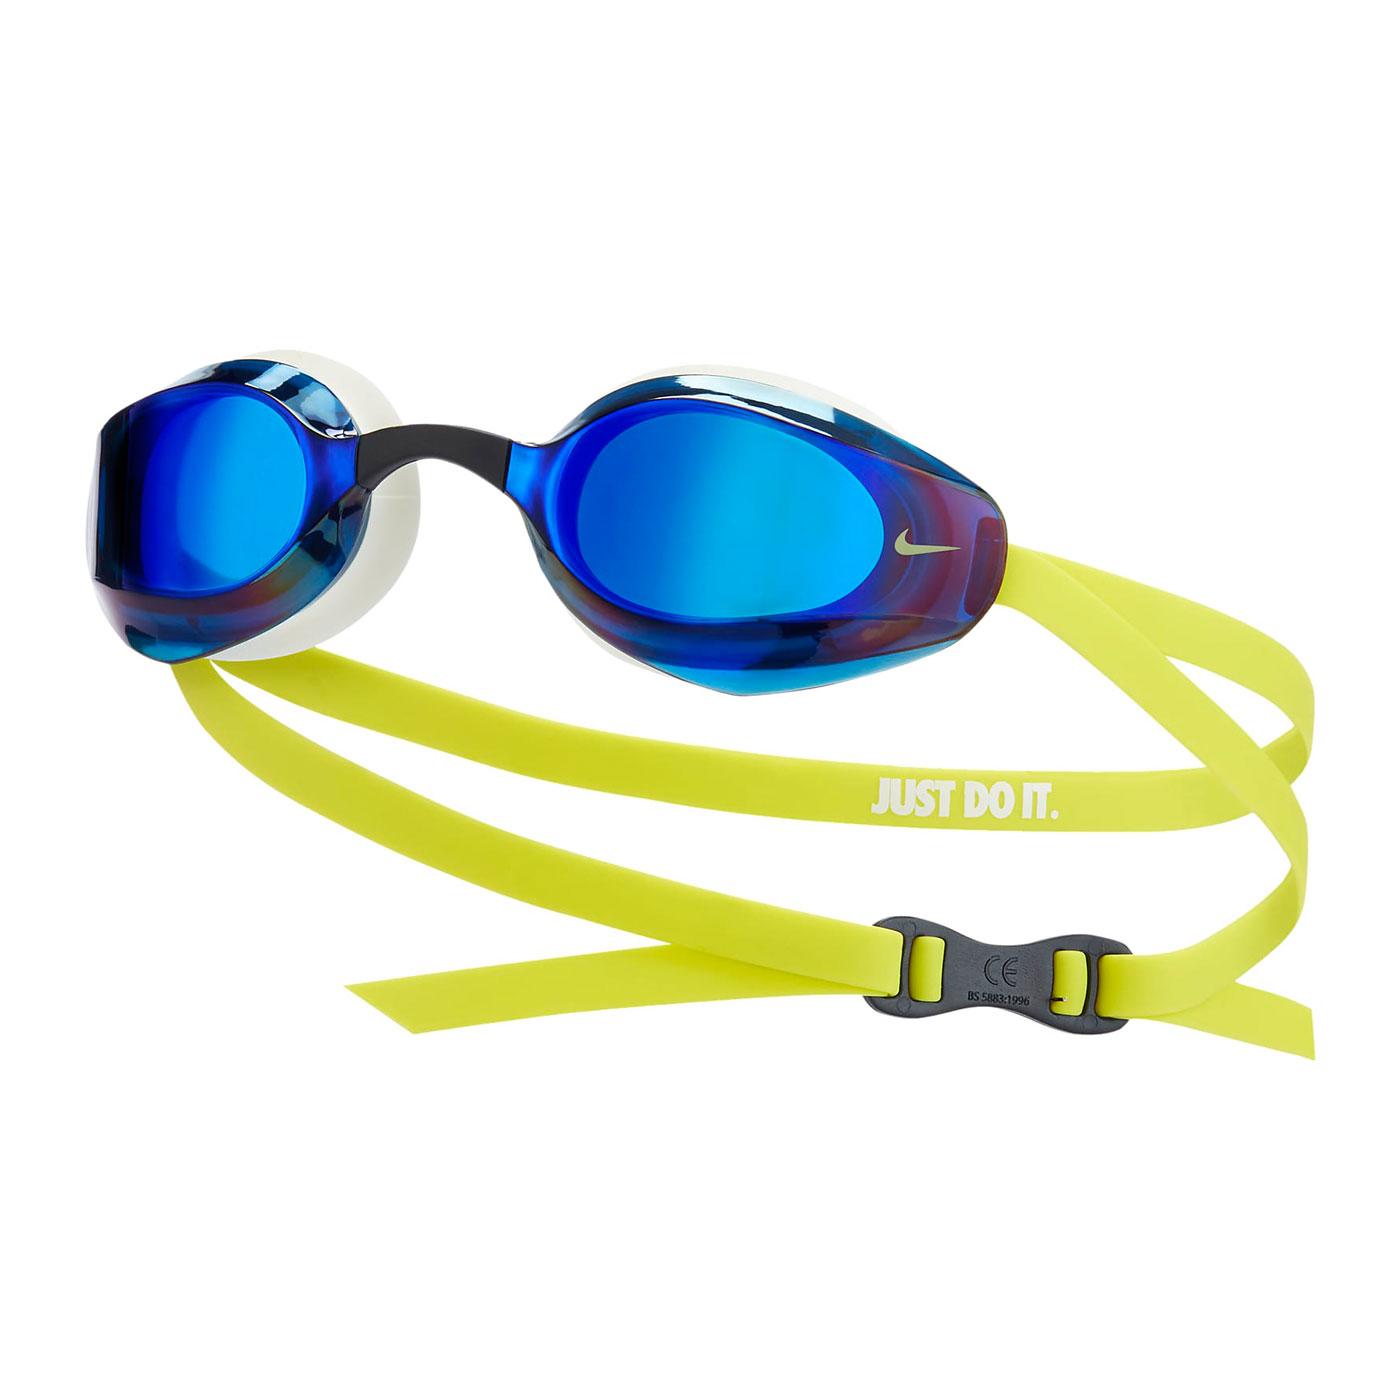 NIKE SWIM 成人專業型鏡面泳鏡 NESSA176-990